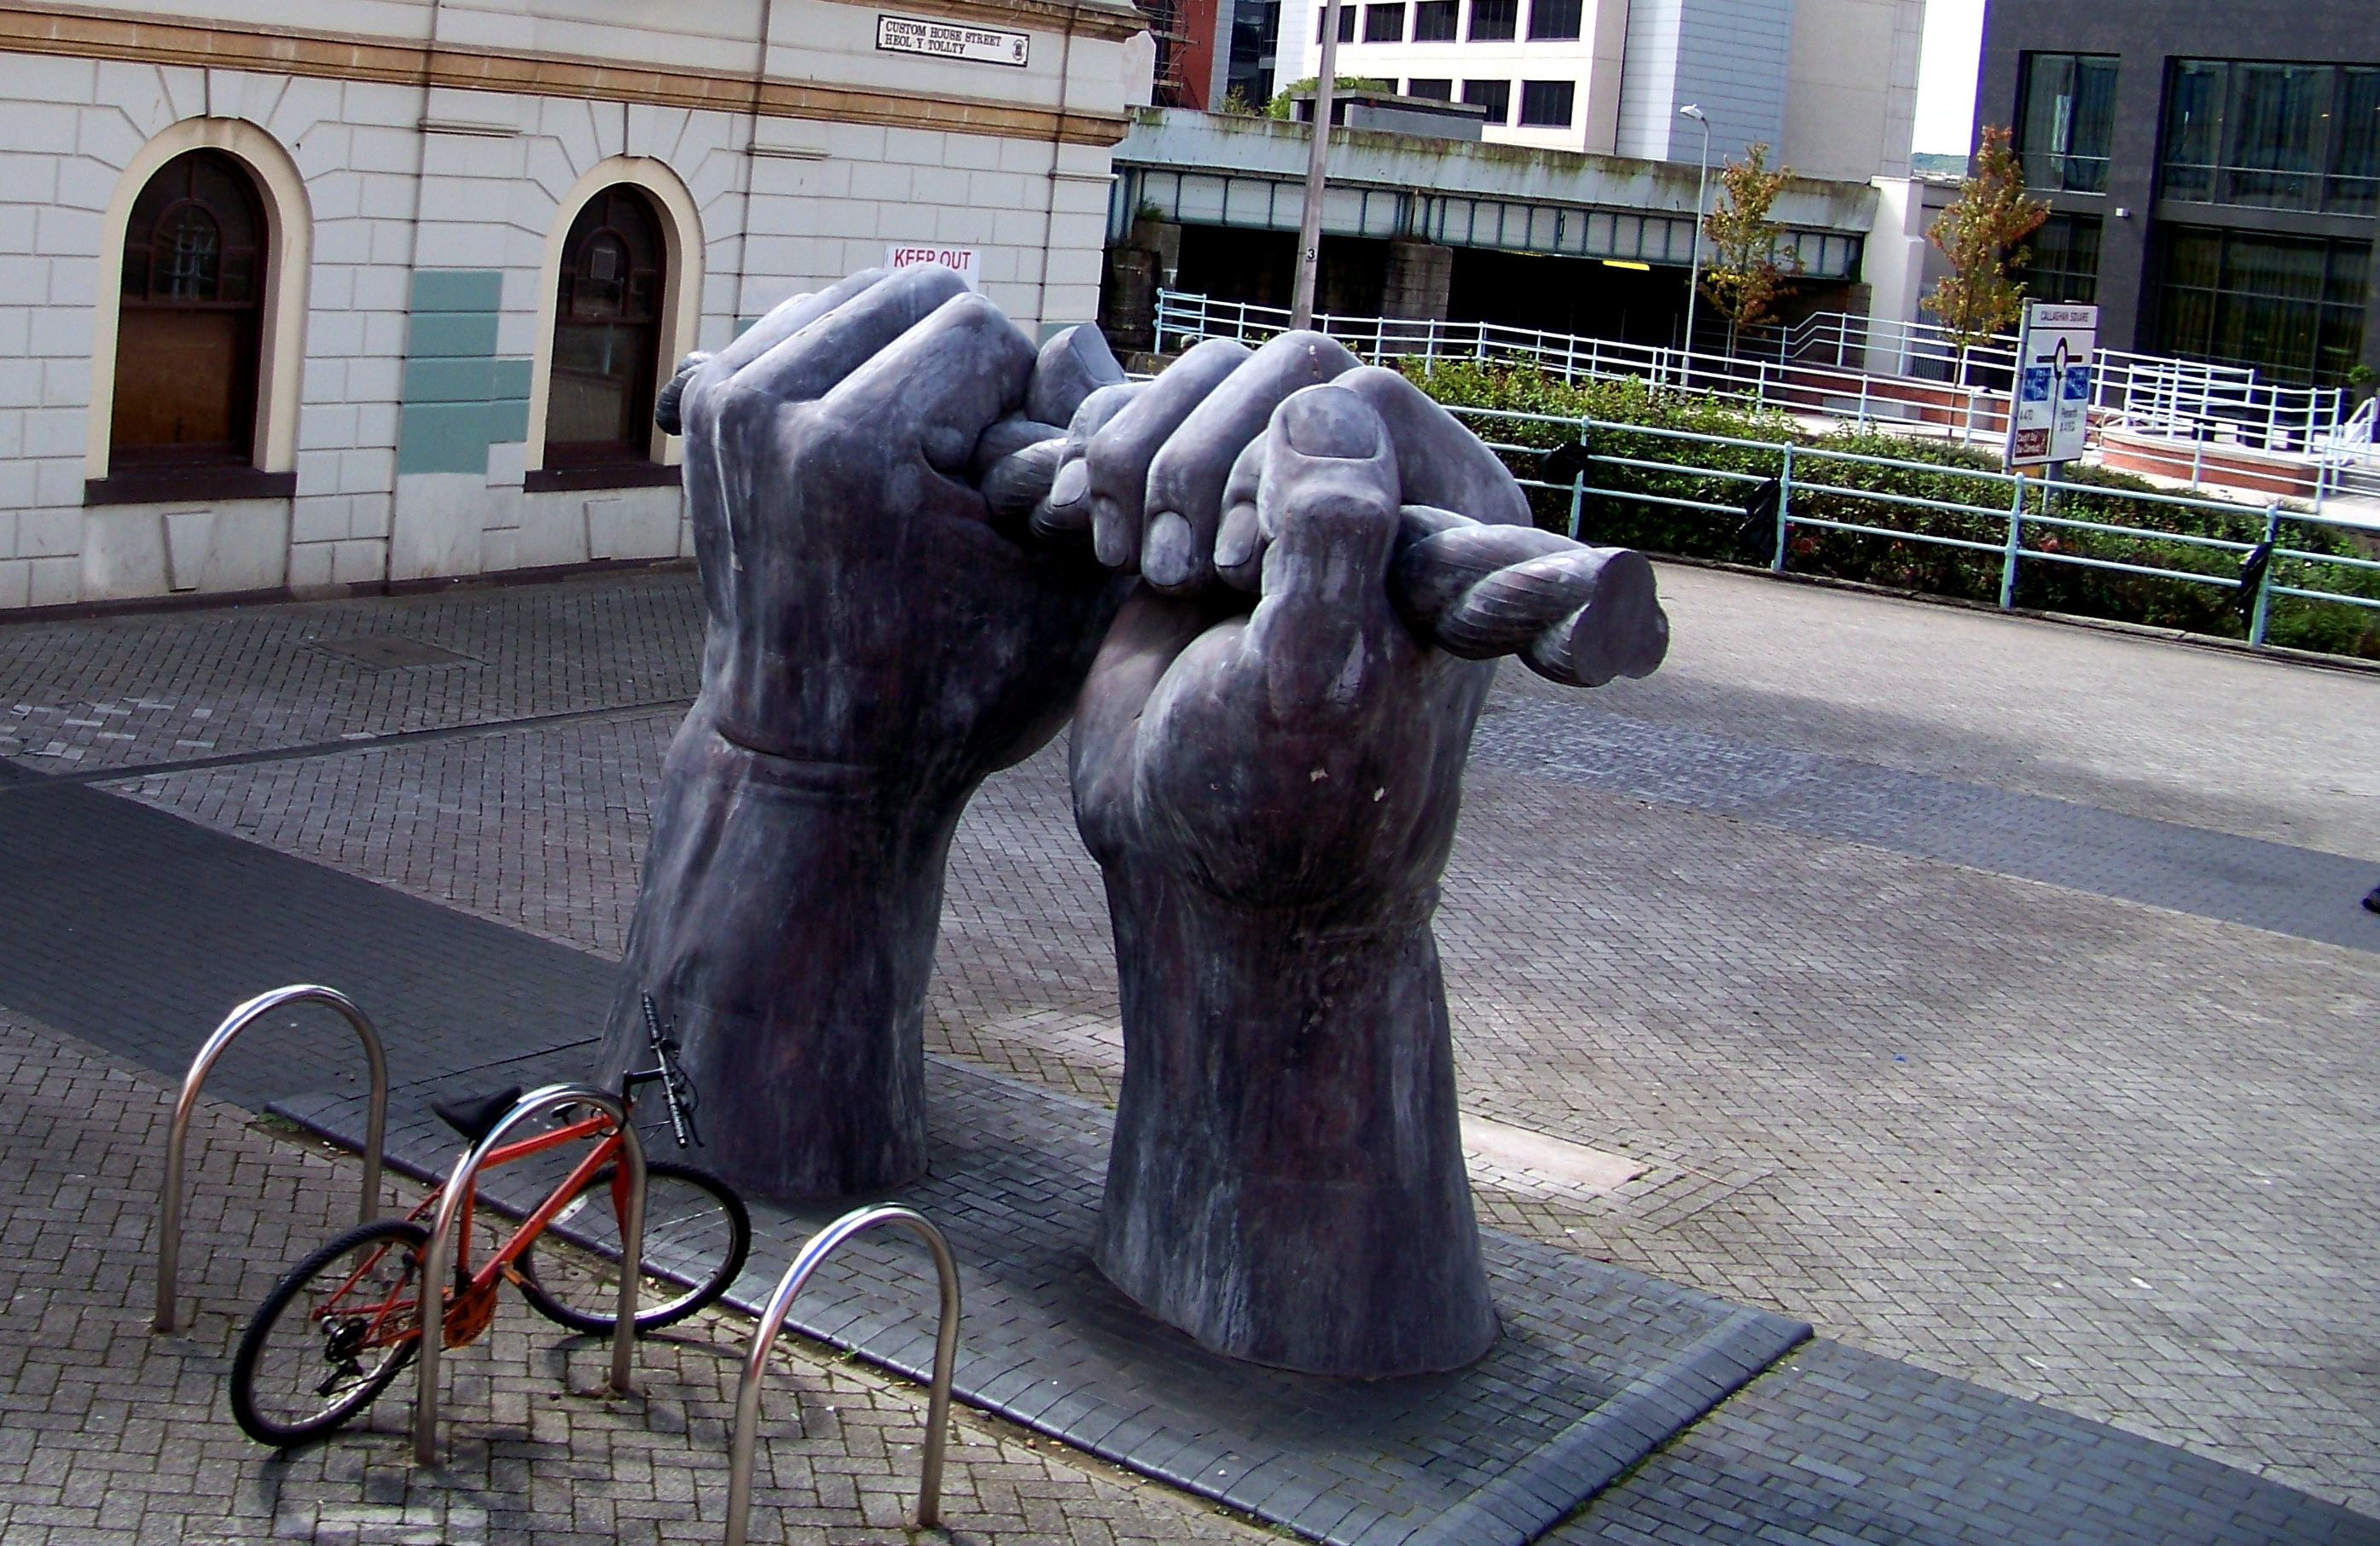 All Hands, Brian Fell